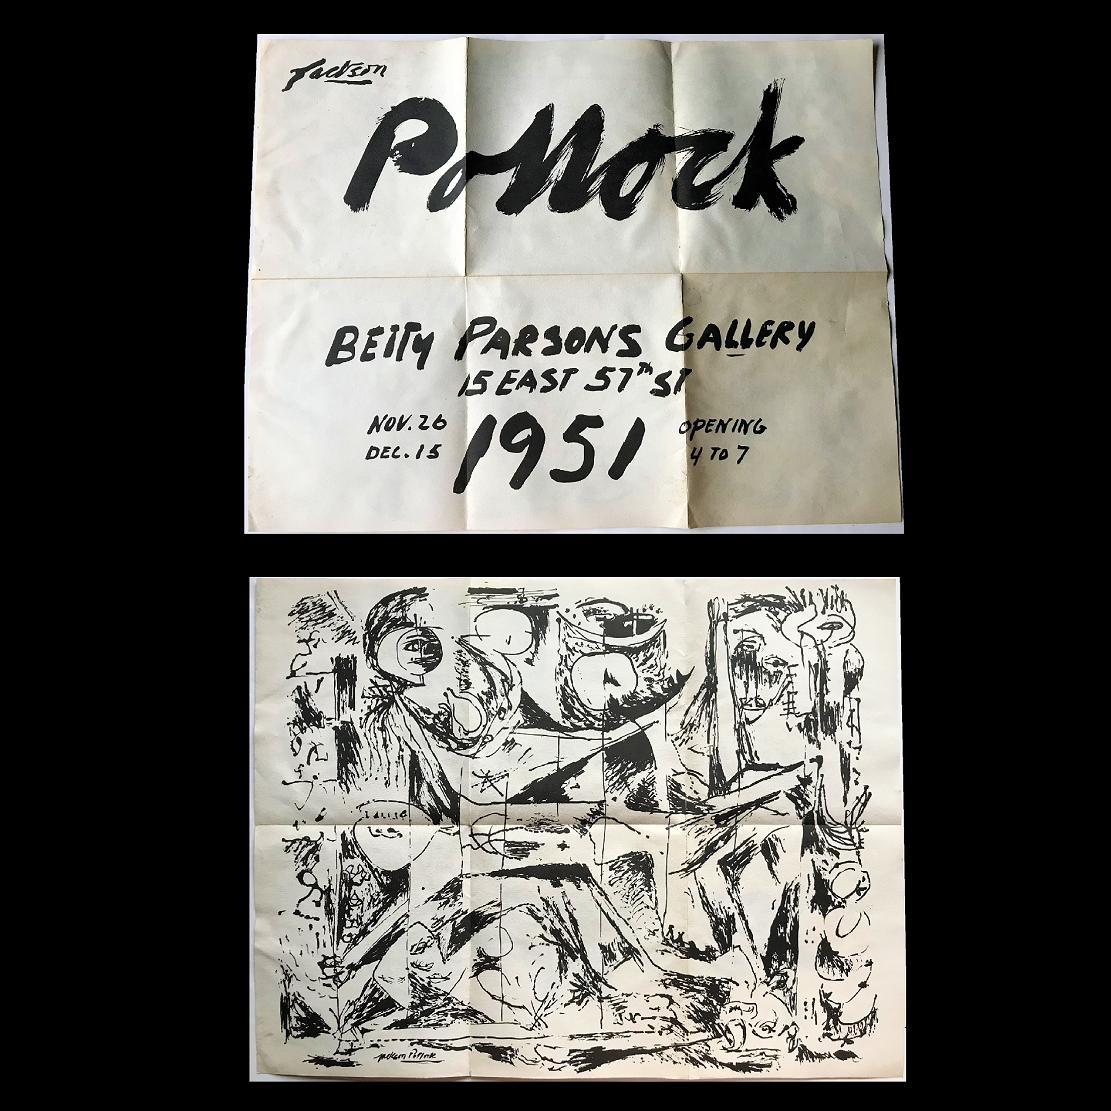 """Jackson Pollock"",  1951, invitation poster, Betty Parsons Gallery."